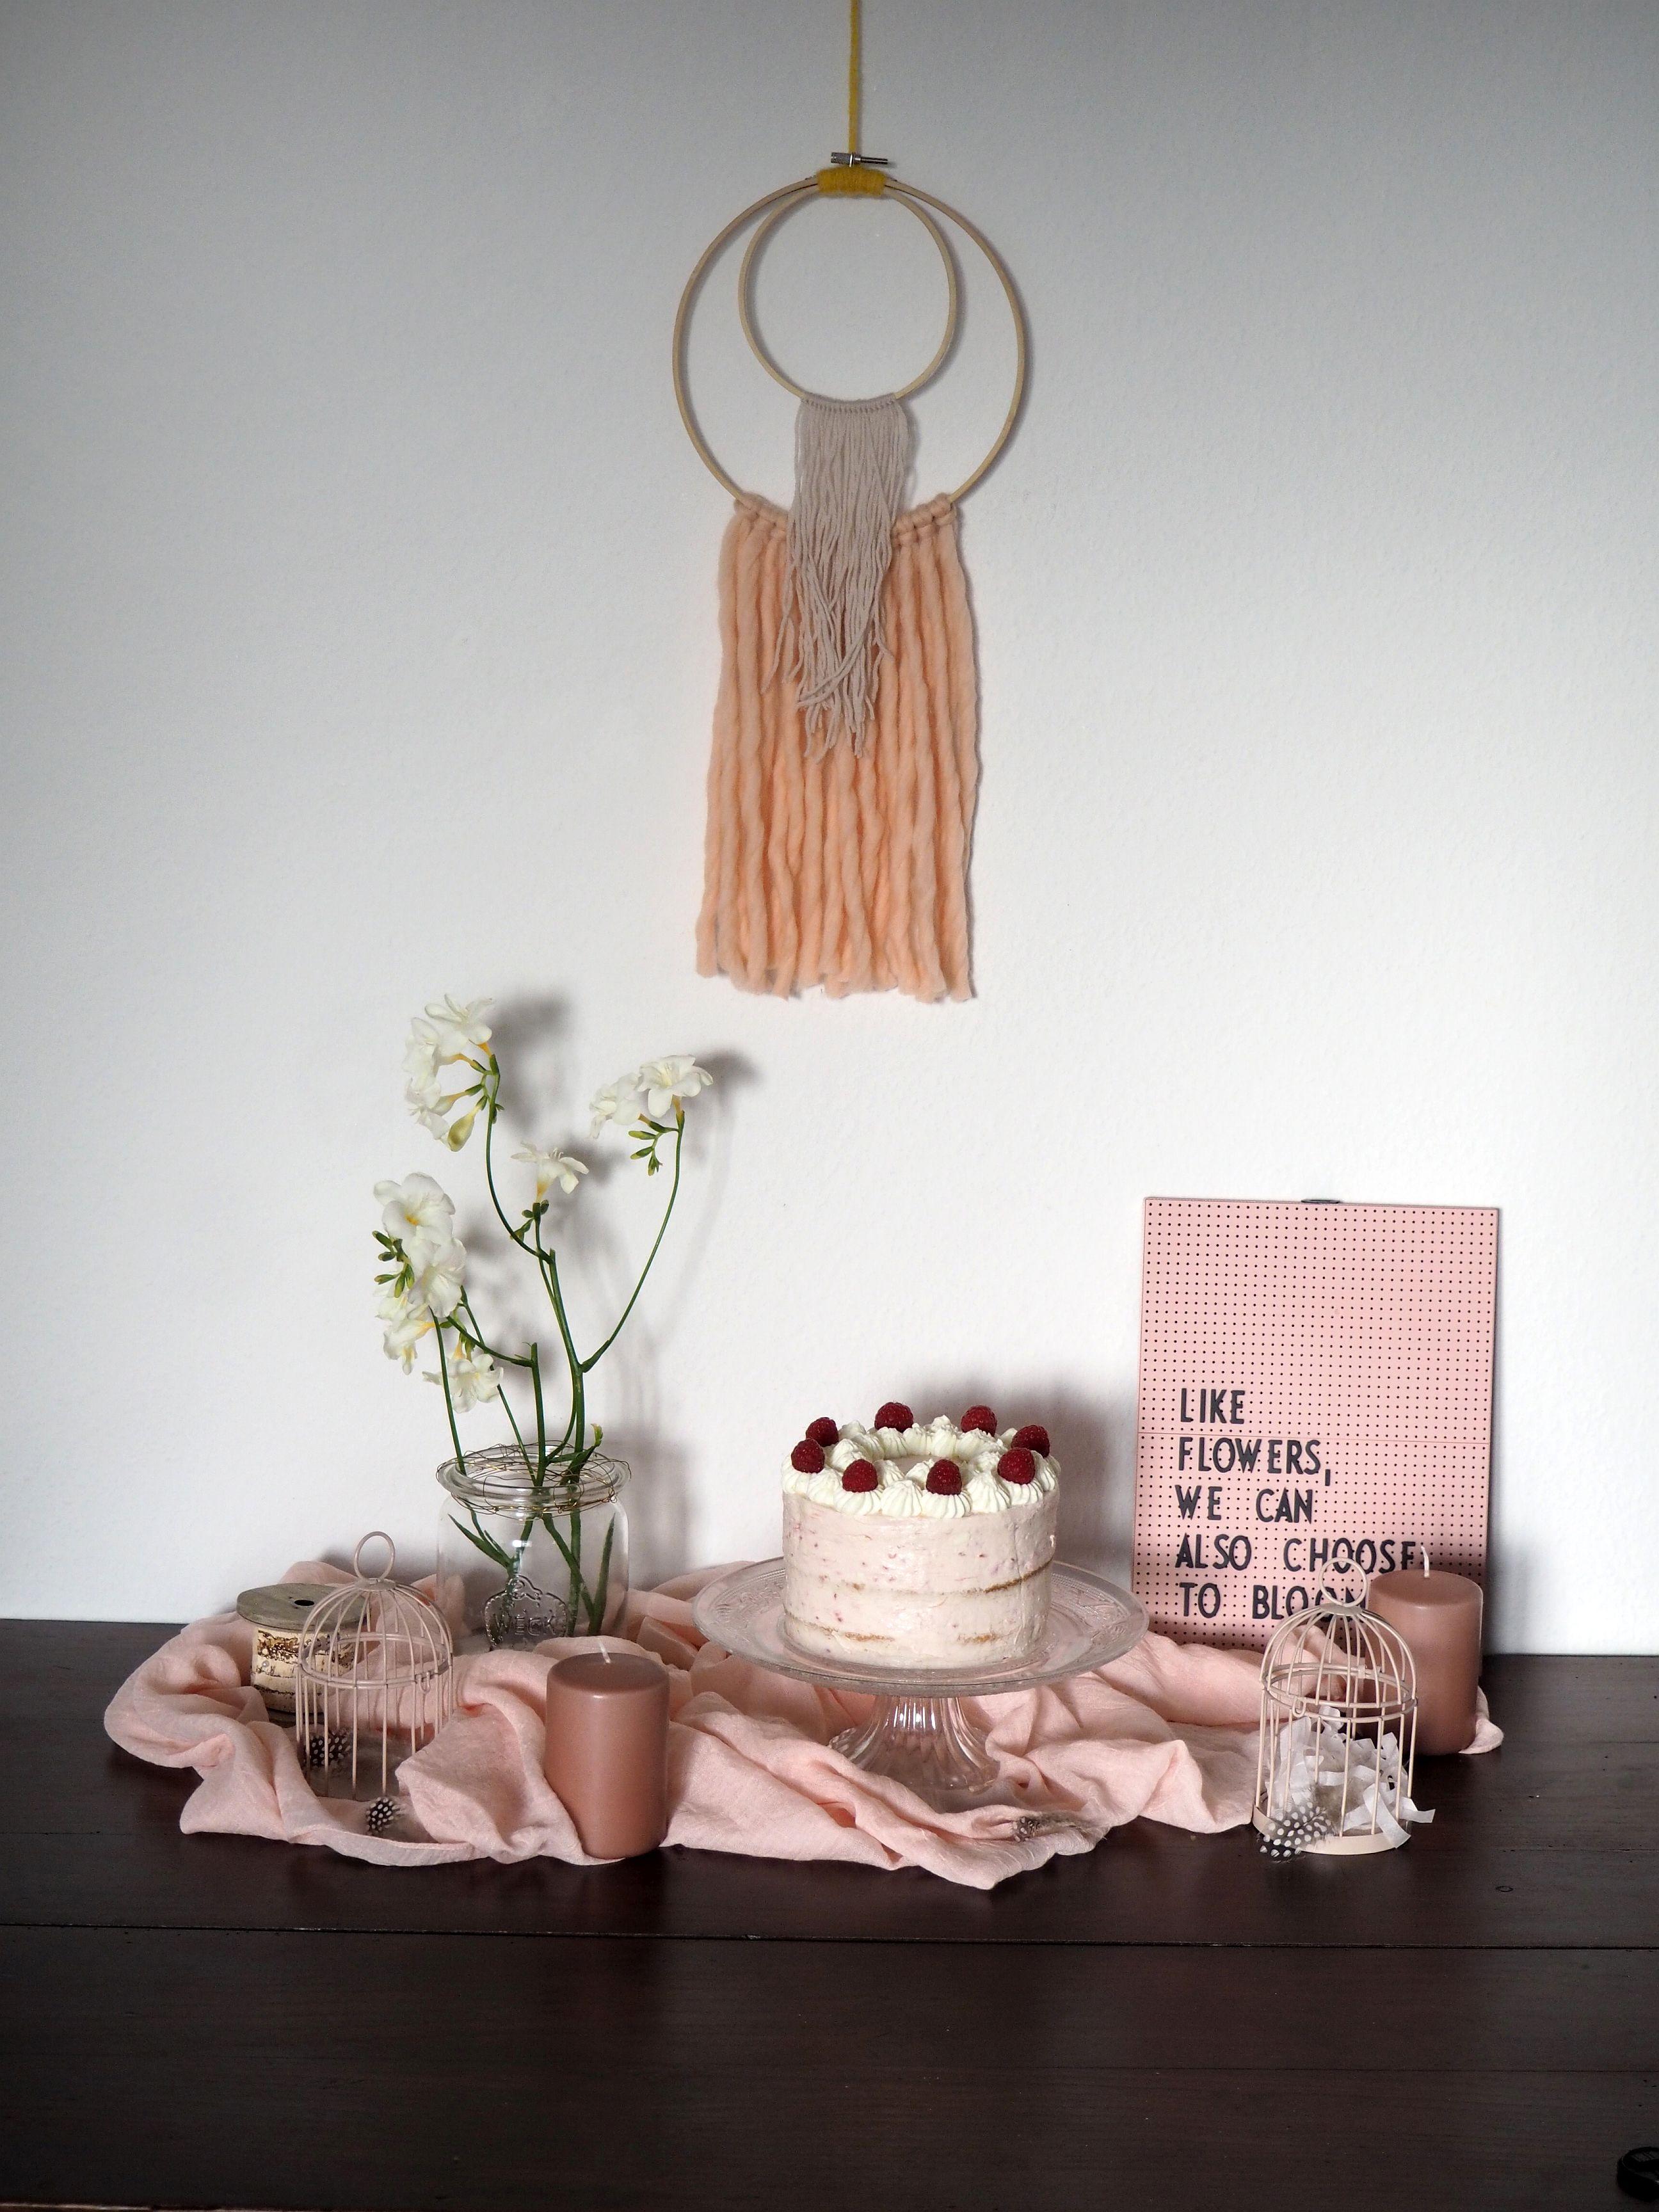 2018-04-skoen-och-kreativ-food-glad-pask-rhabarber-himbeer-toertchen-mit-crunch-zu-ostern (3)